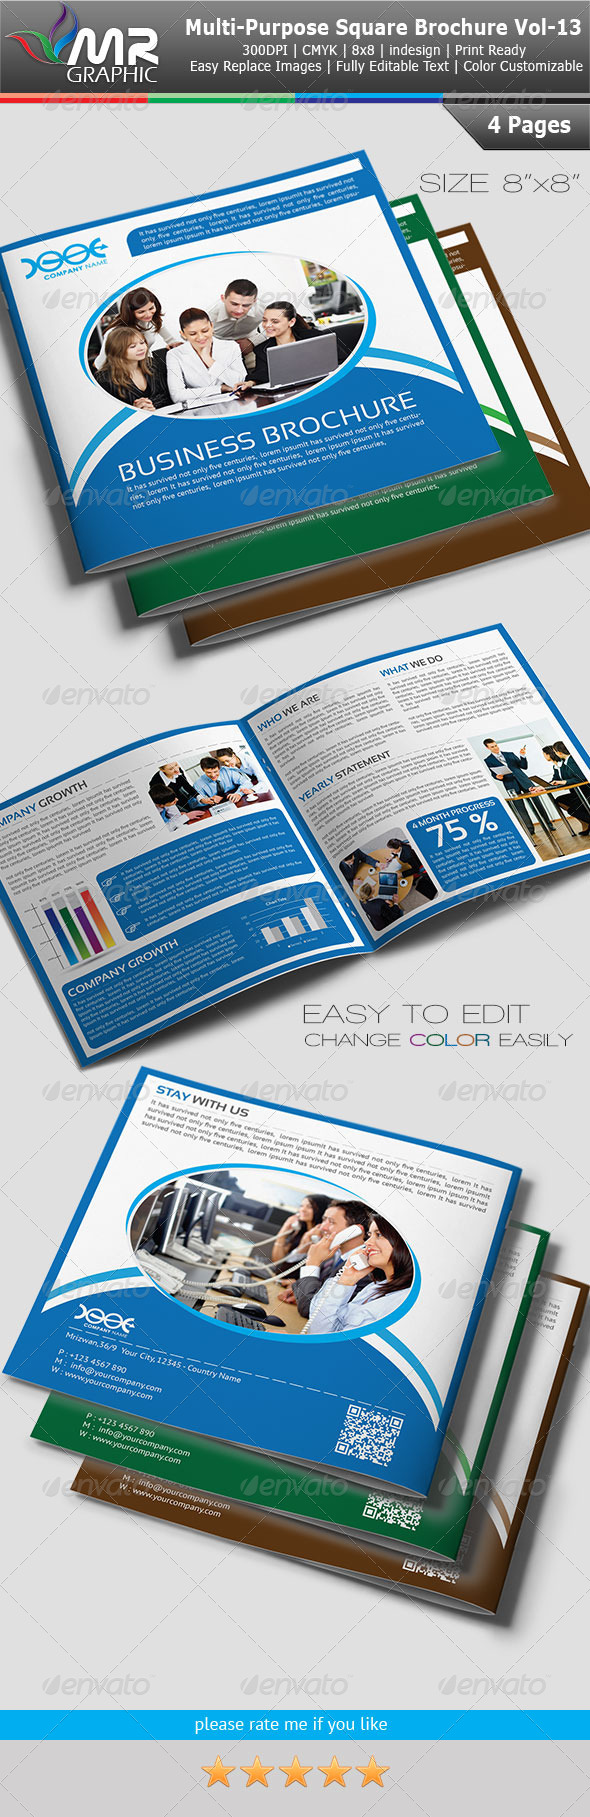 Multipurpose Square Business Brochure Vol-13 - Corporate Brochures